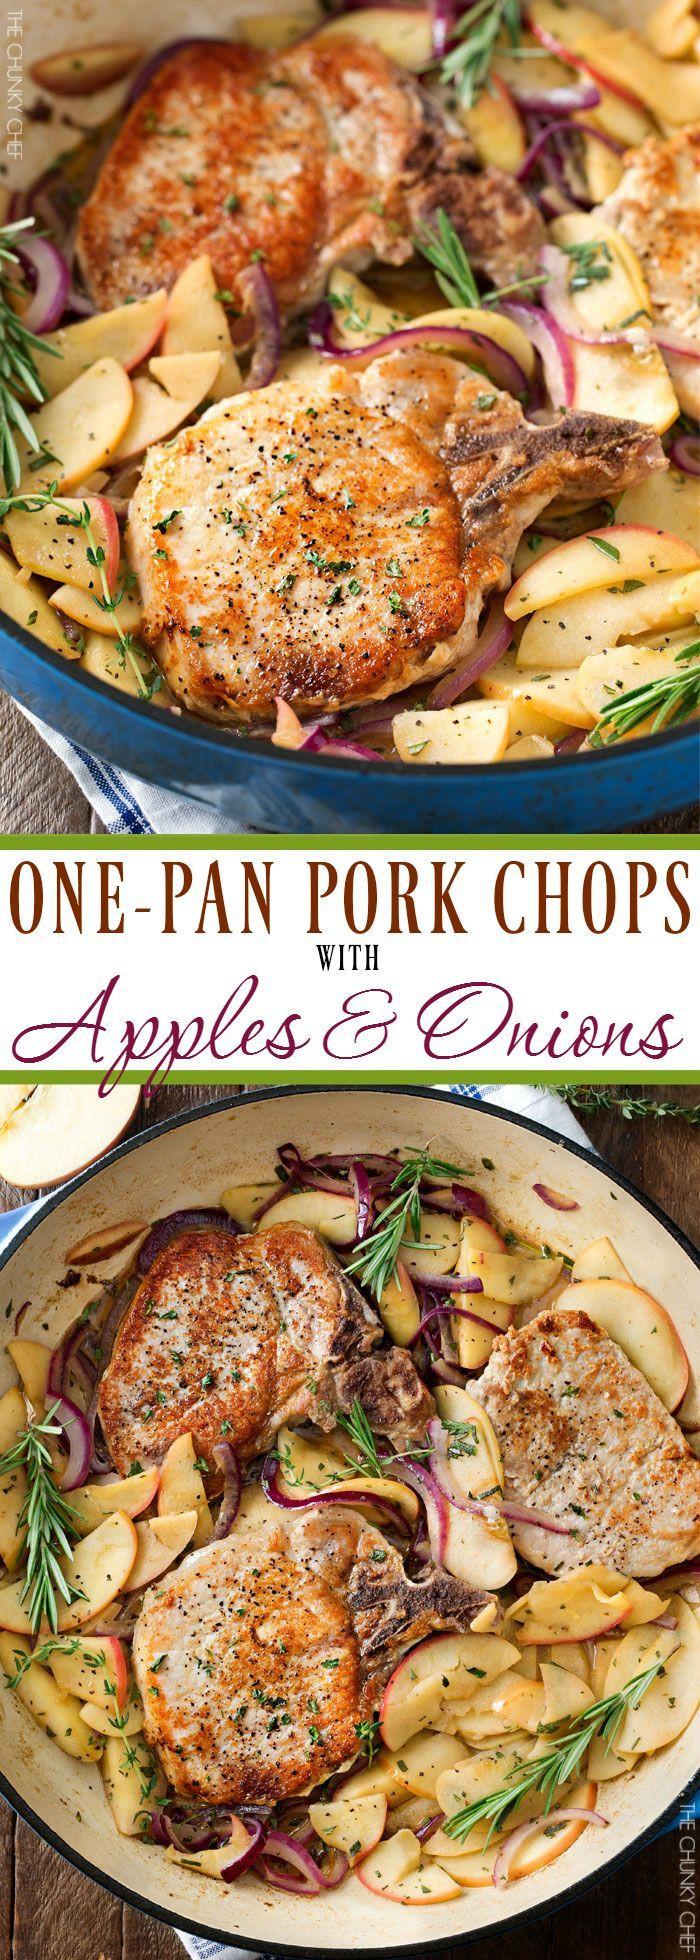 Heart Healthy Pork Chop Recipes  Best 25 Fall ideas on Pinterest